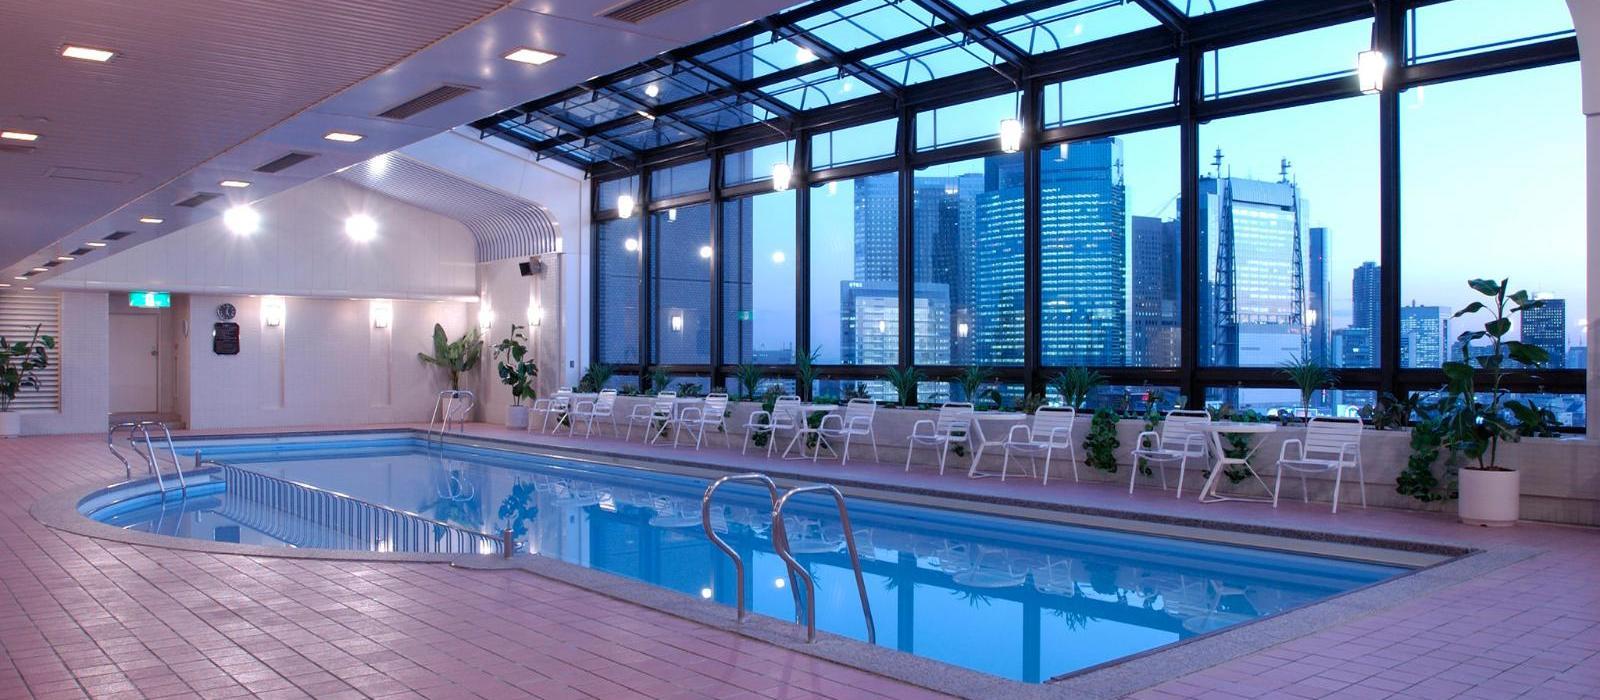 東京帝國酒店(Imperial Hotel Tokyo) 泳池圖片  www.yisecj.live